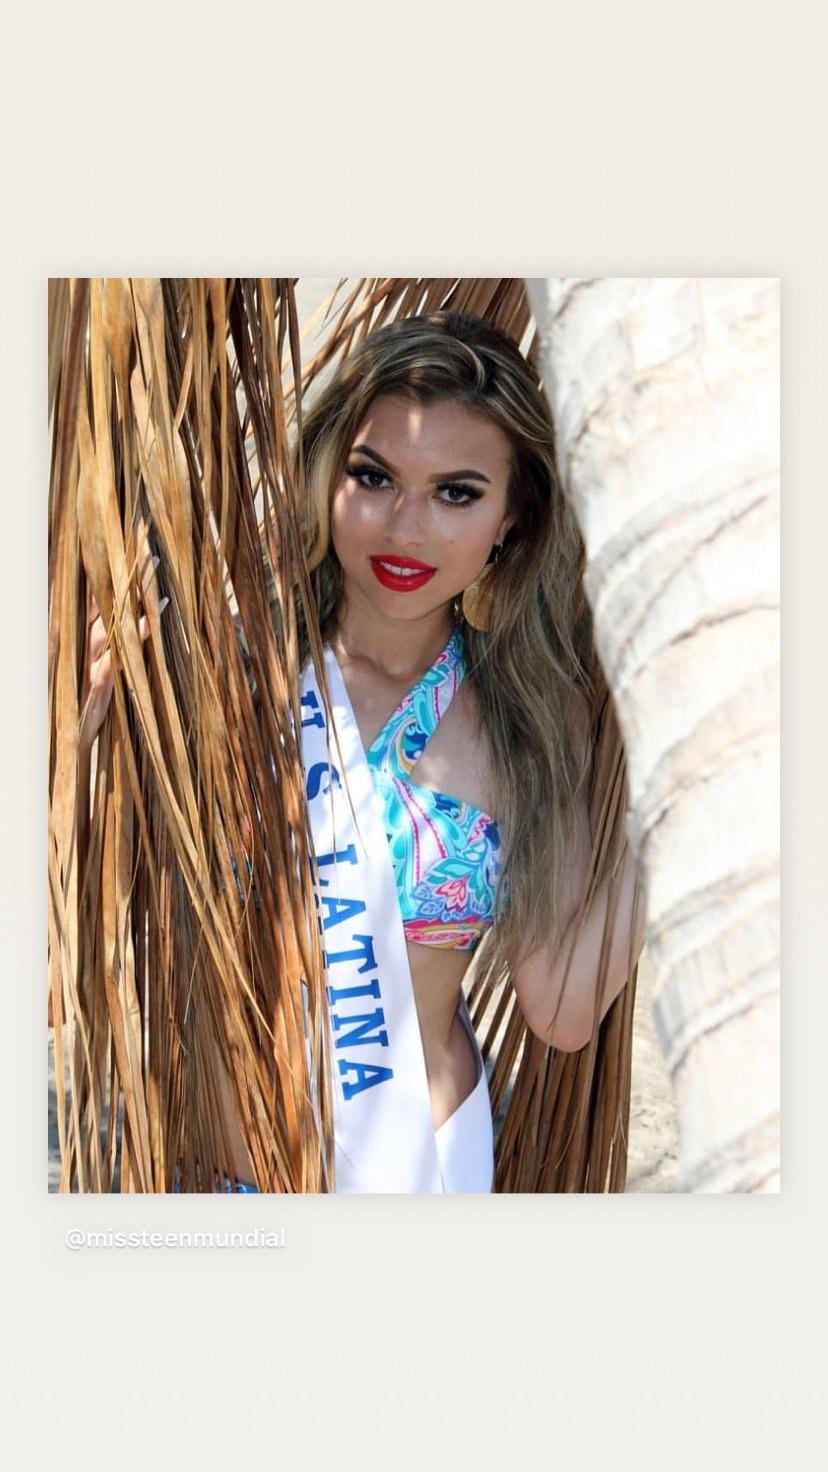 estefany frost, miss teen mundial latina usa 2019. - Página 4 59352310